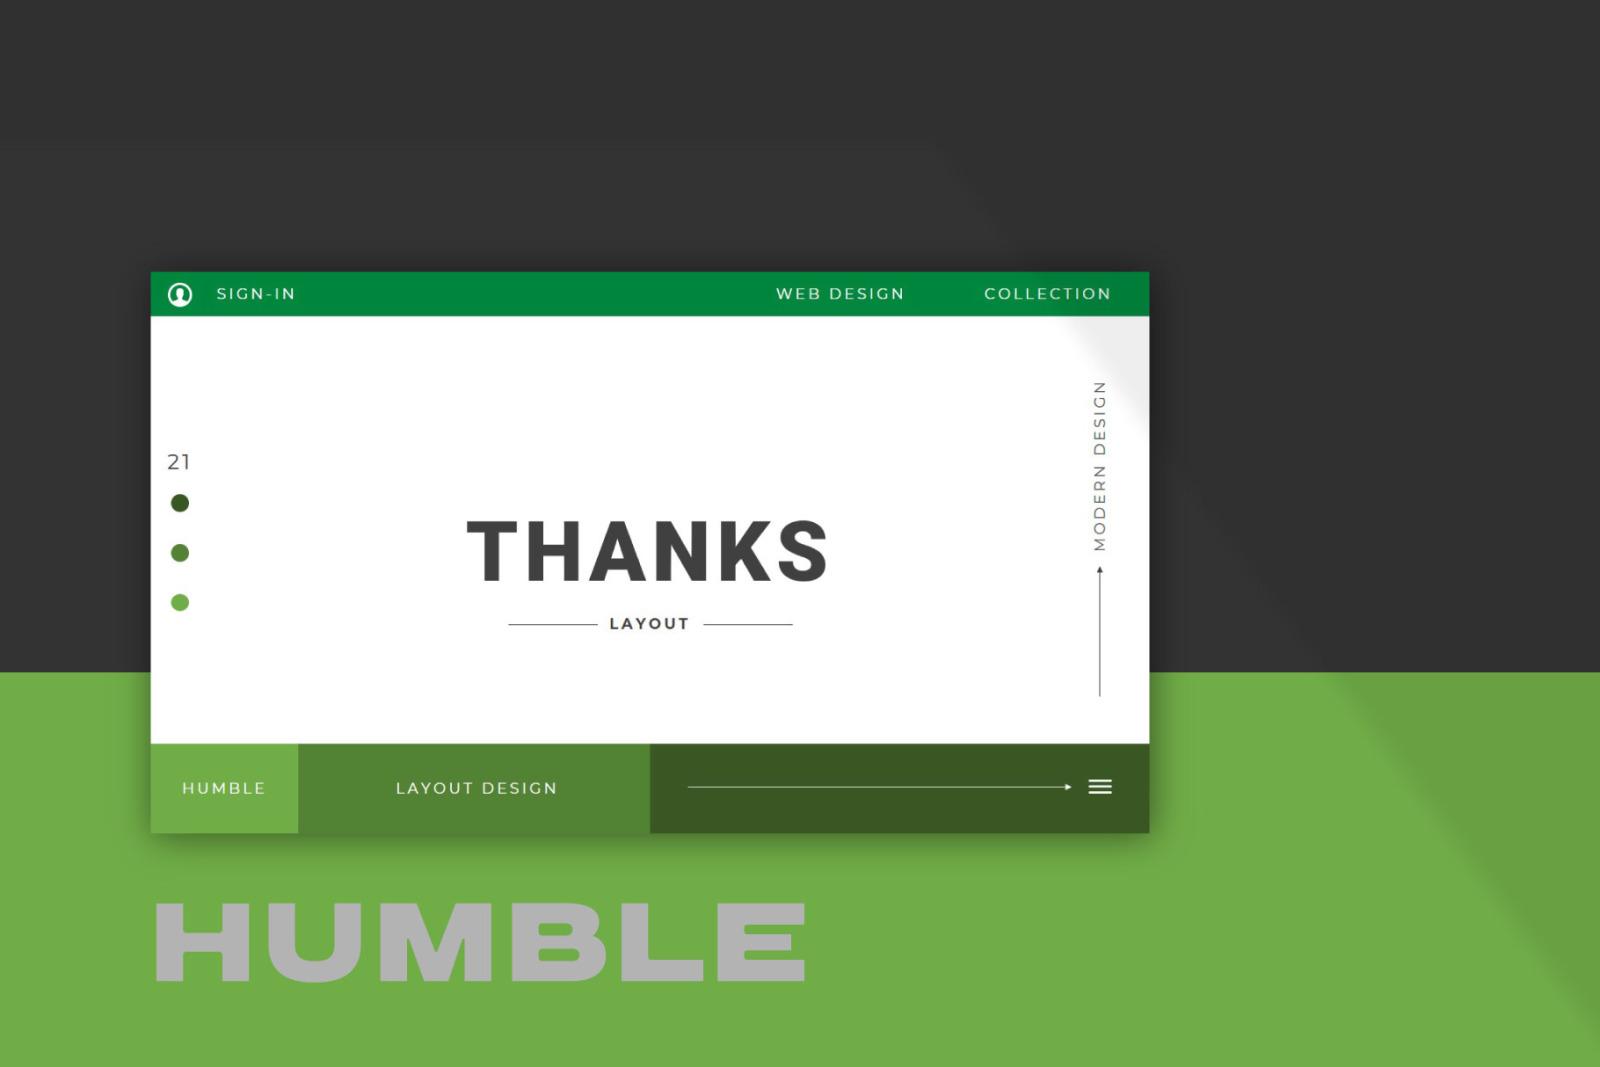 HUMBLE Google Slides